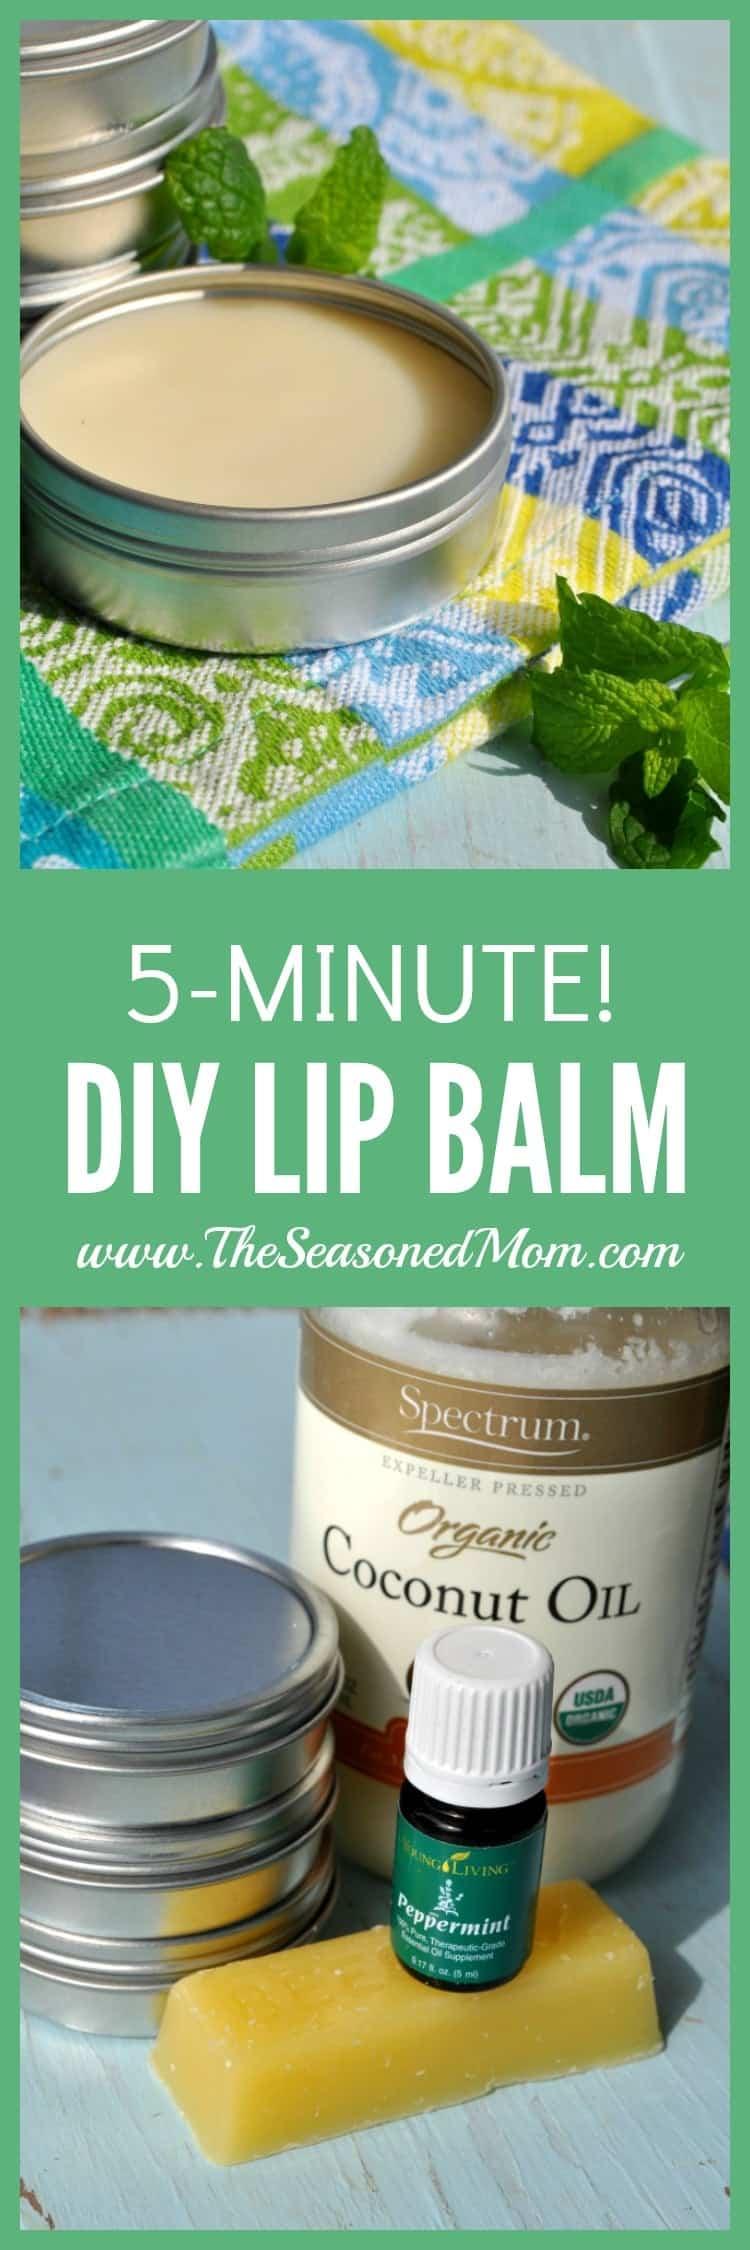 5 Minute Makeup Must Haves: 5-Minute DIY Lip Balm